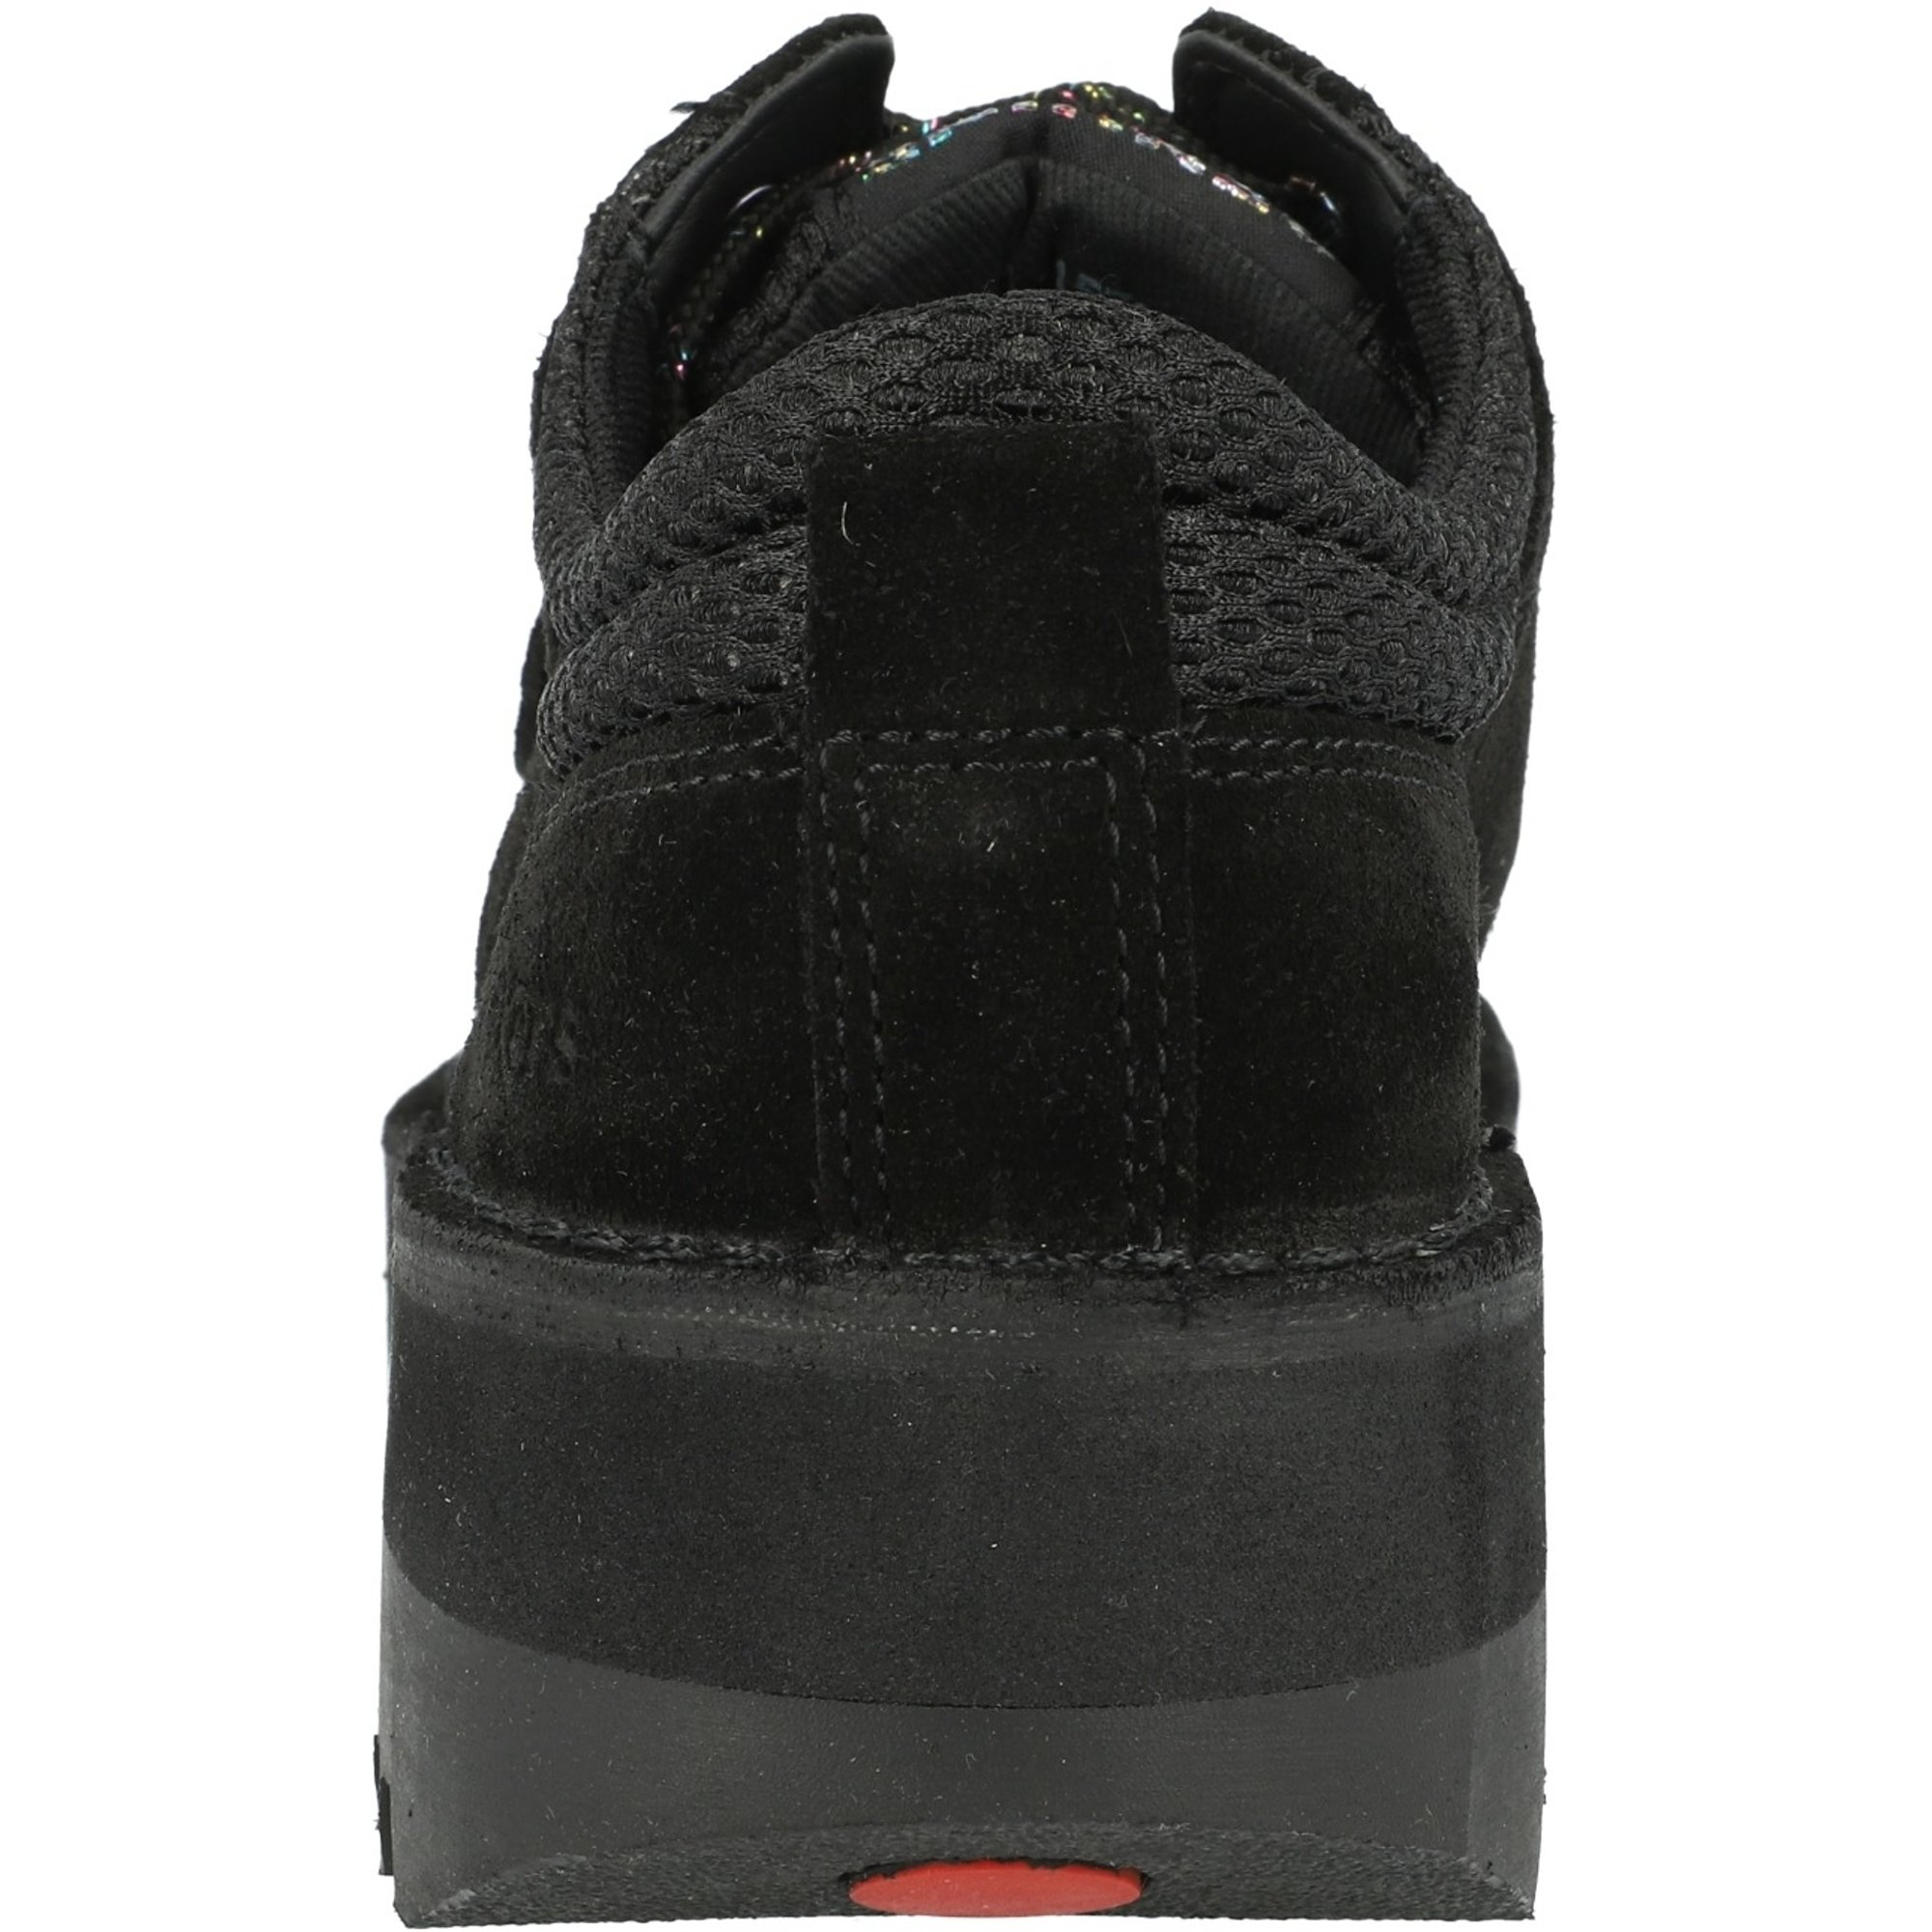 Kickers Kick Lo Cosmik Black Suede Adult Shoes